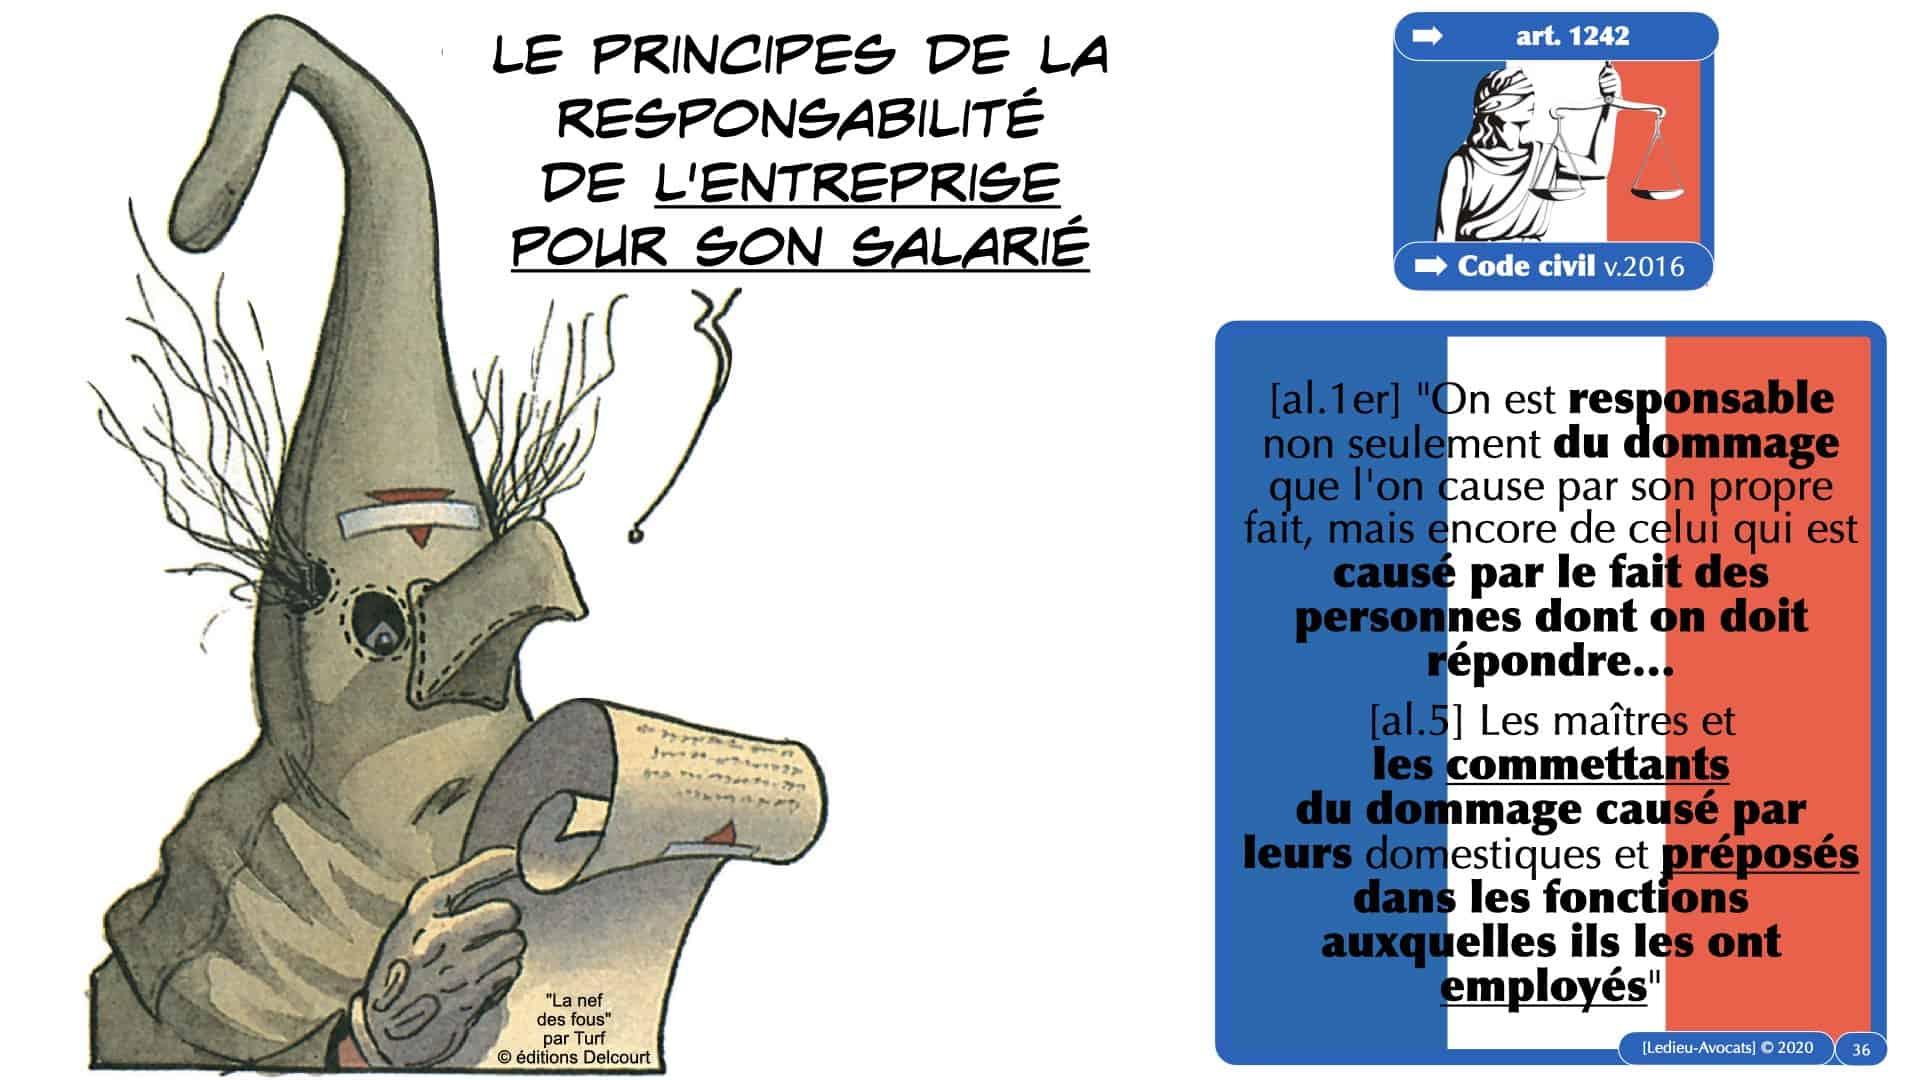 nomadisme et CYBER SECURITE webinar TheGreenBow Cybersec&you Constellation.law 16:9° © Ledieu-Avocats-01-07-2020.036